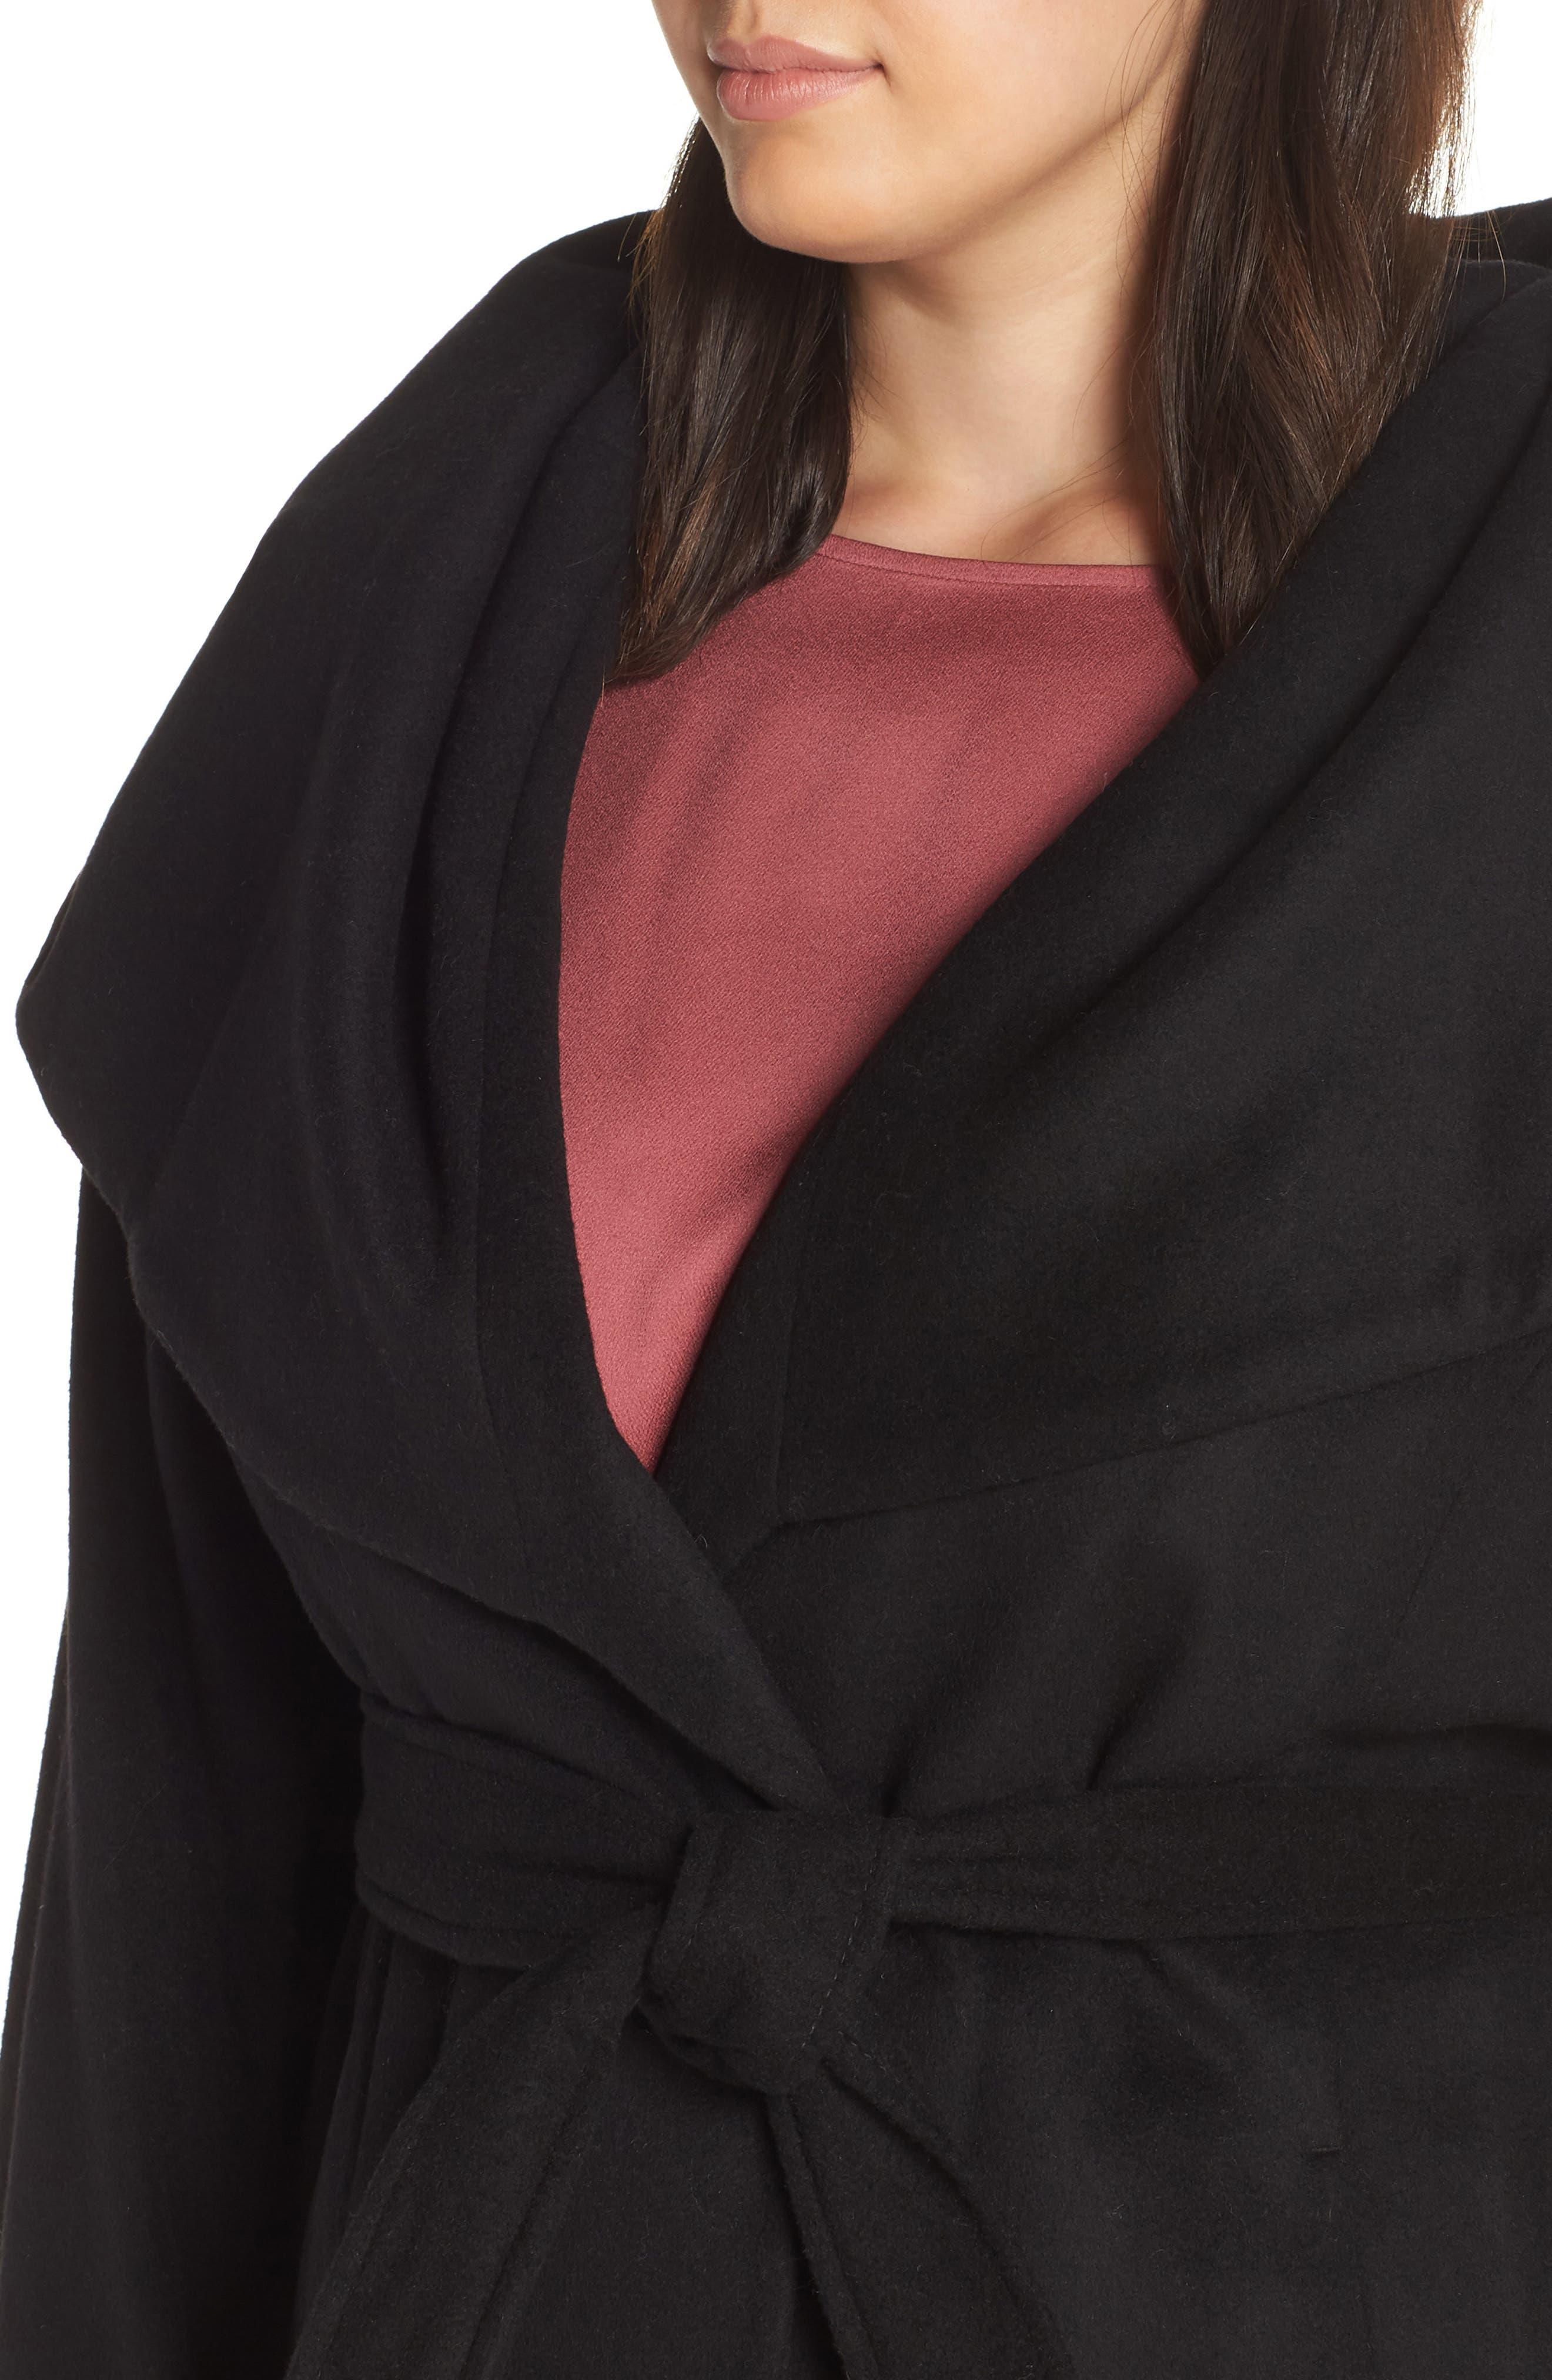 Marla Cutaway Wrap Coat with Oversize Collar,                             Alternate thumbnail 4, color,                             002